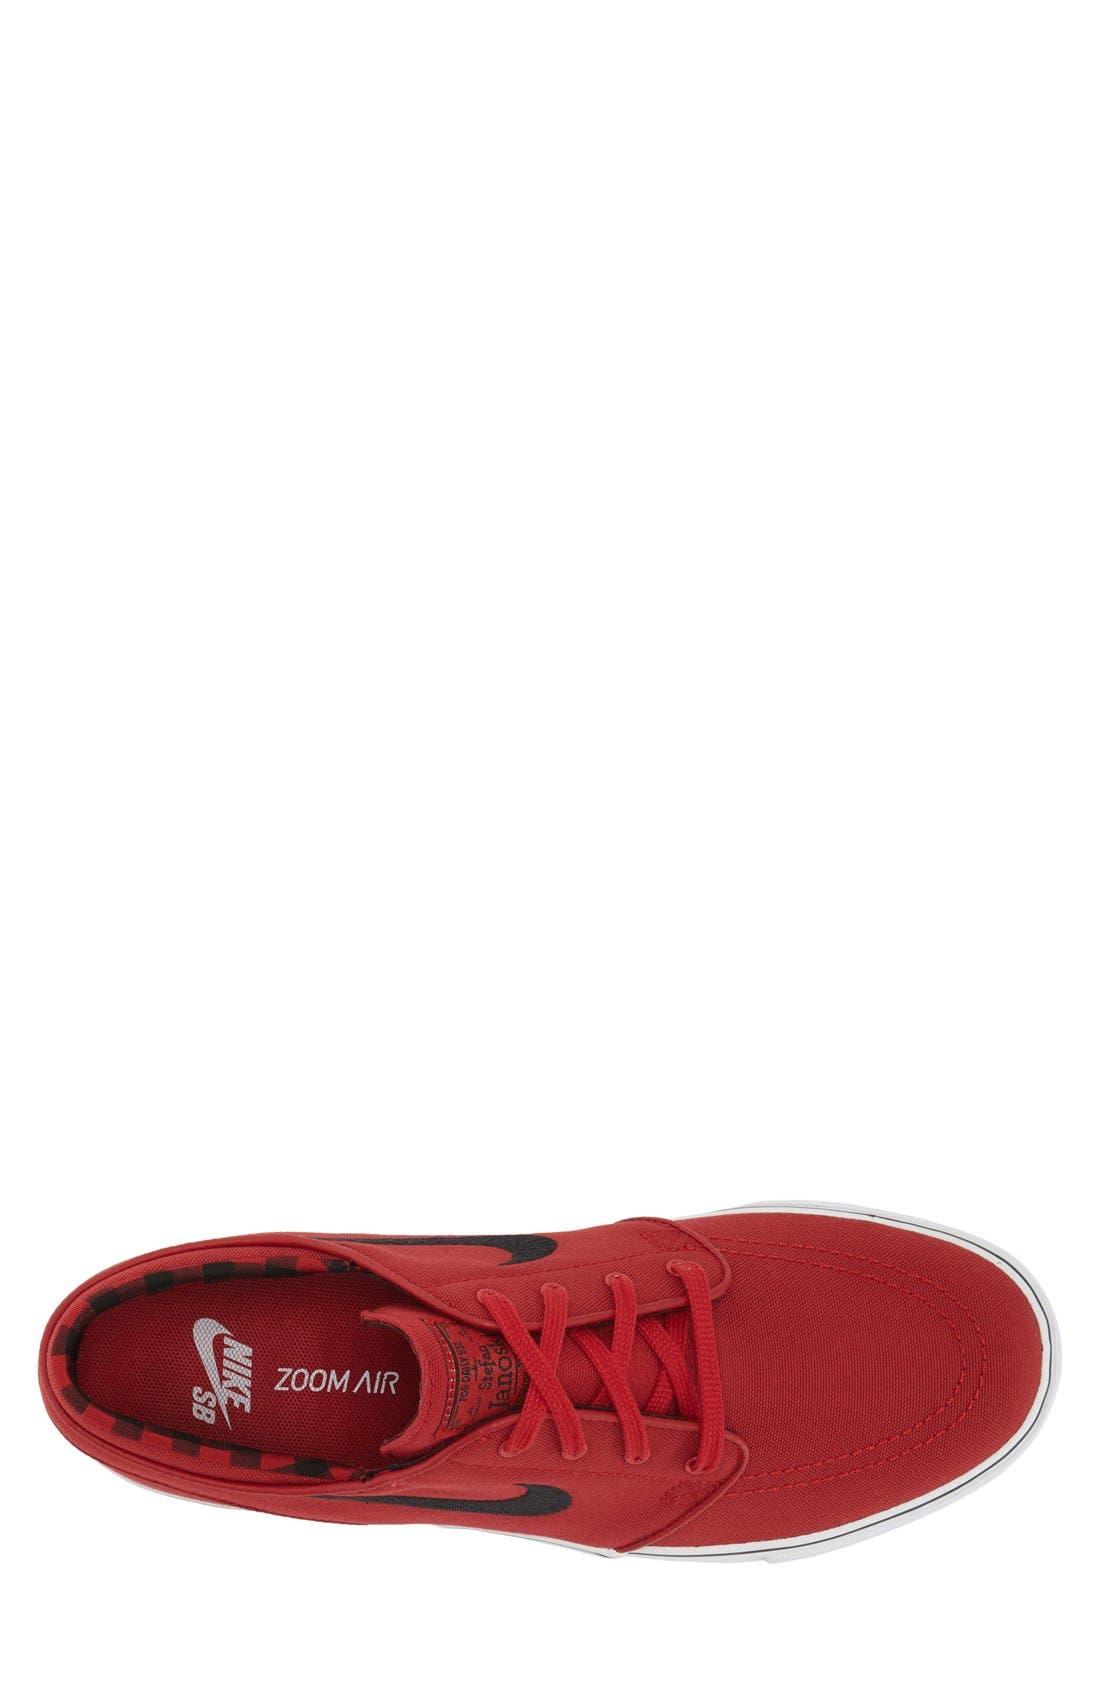 Zoom - Stefan Janoski SB Canvas Skate Shoe,                             Alternate thumbnail 123, color,